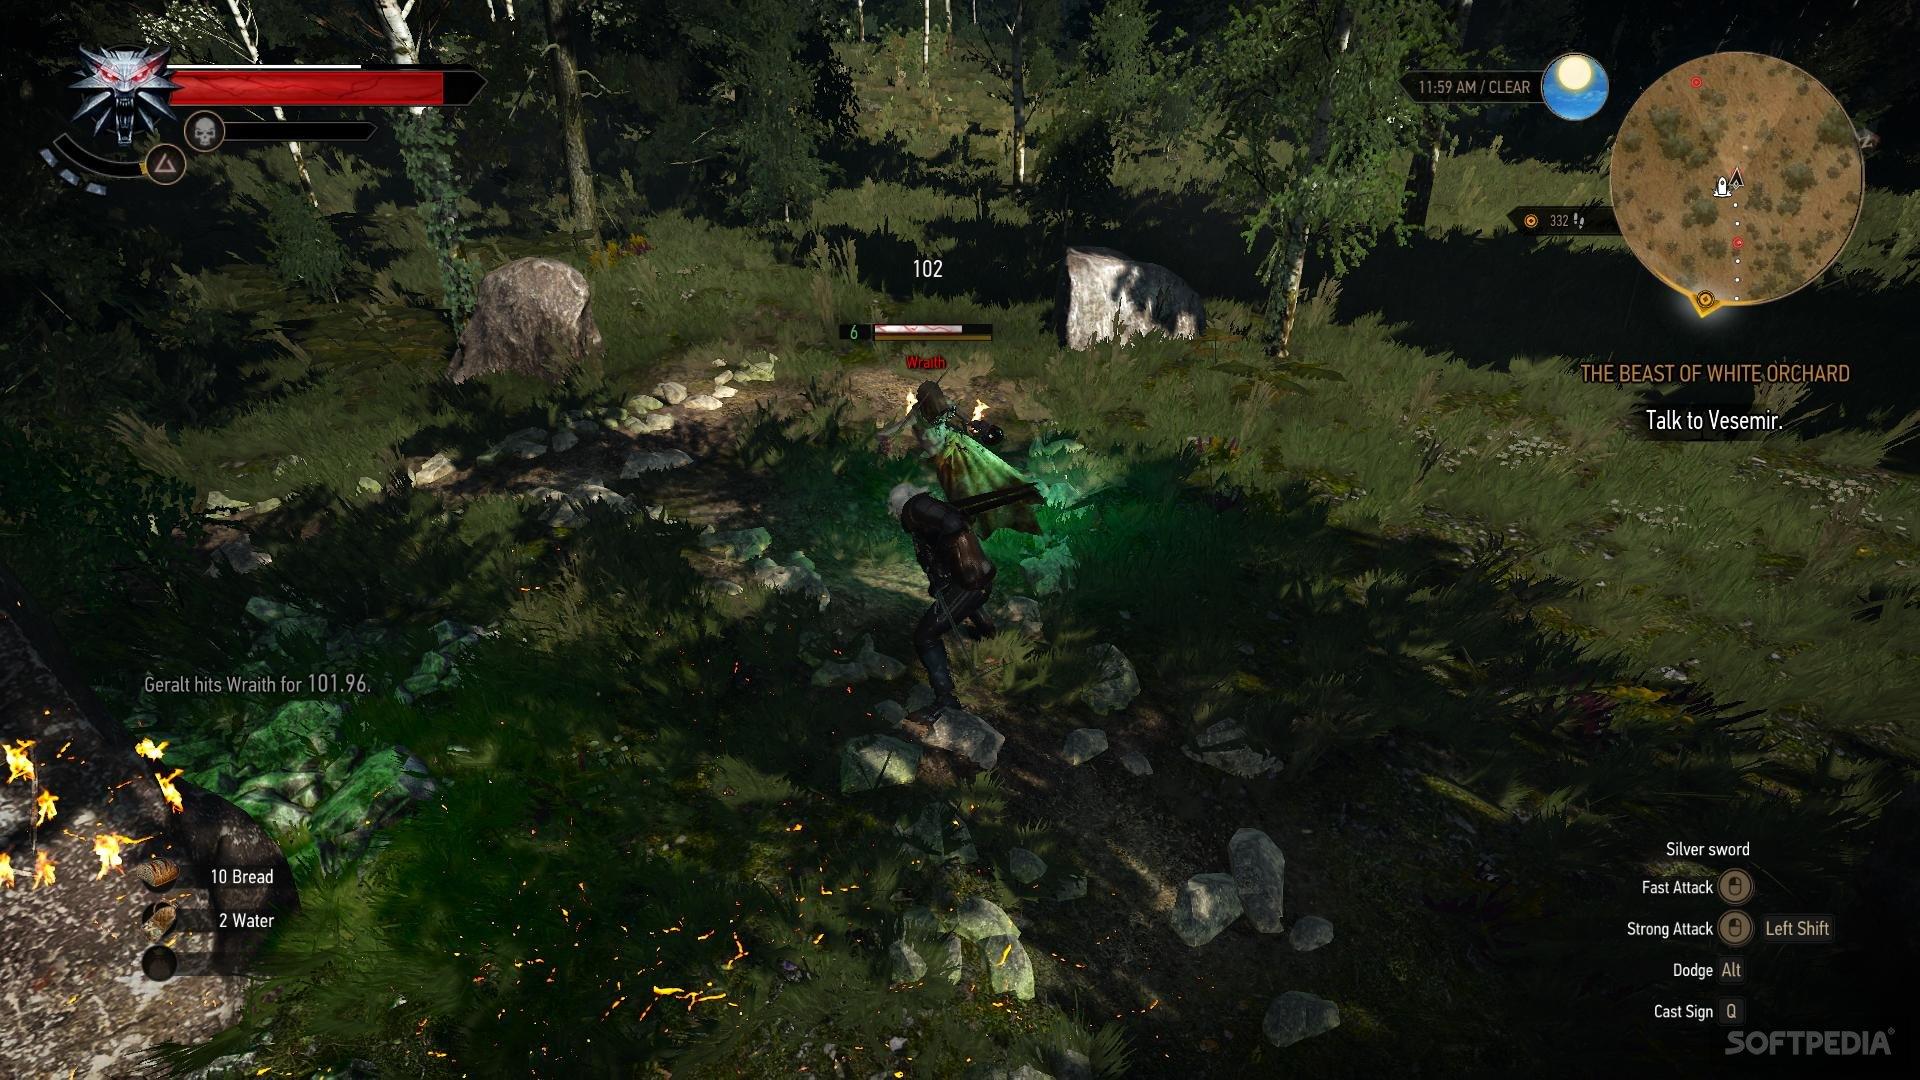 The Witcher 3: Wild Hunt Script Is 450,000 Words Long, Took